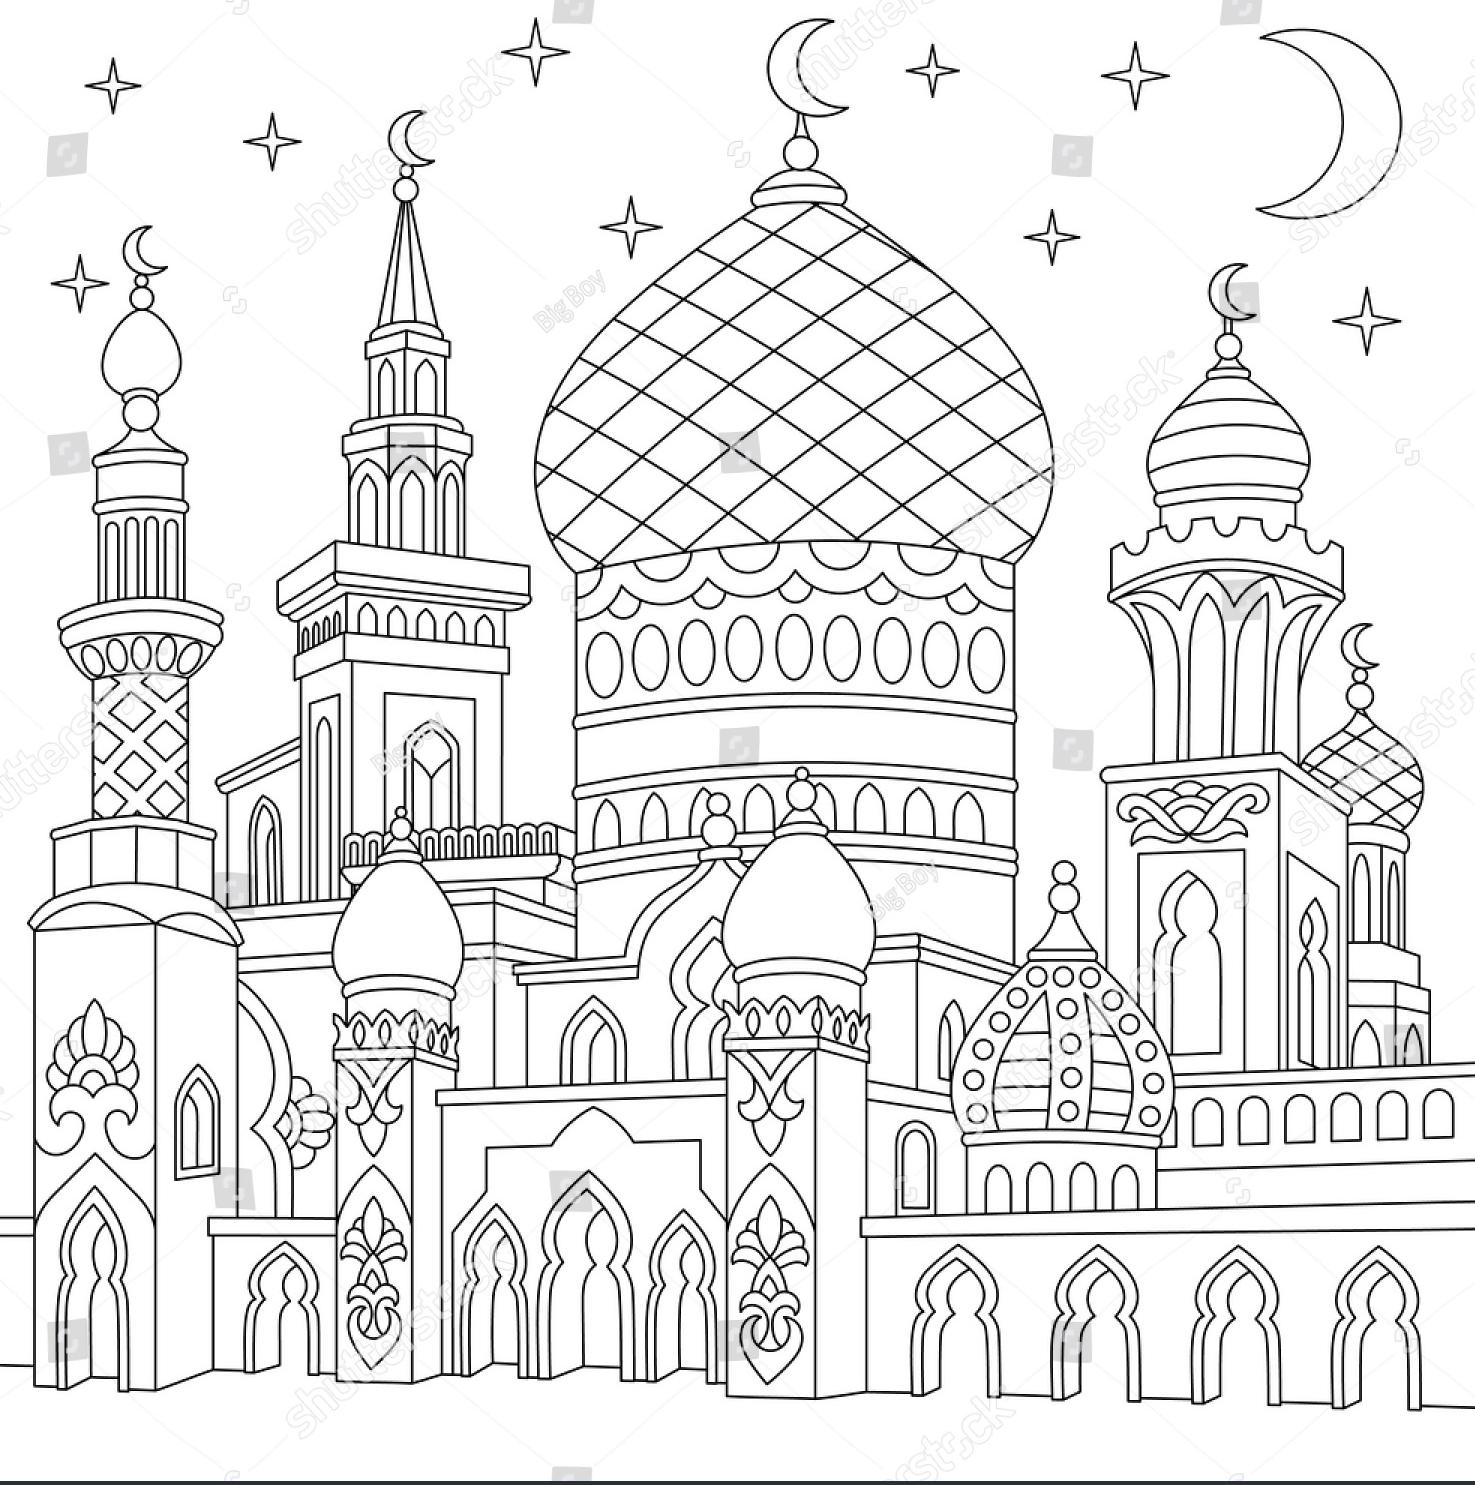 Sketsa Masjid Warna Related Keywords Suggestions Sketsa Masjid